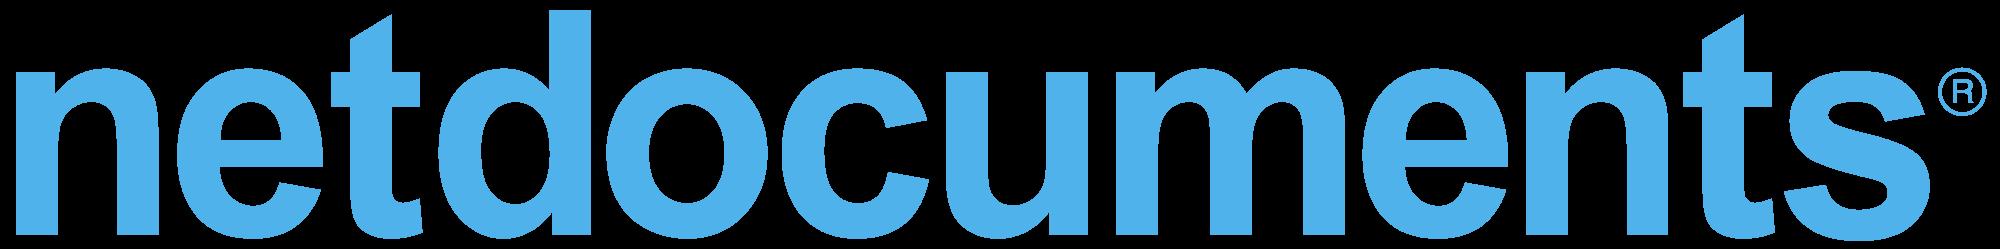 Logo Net Documents